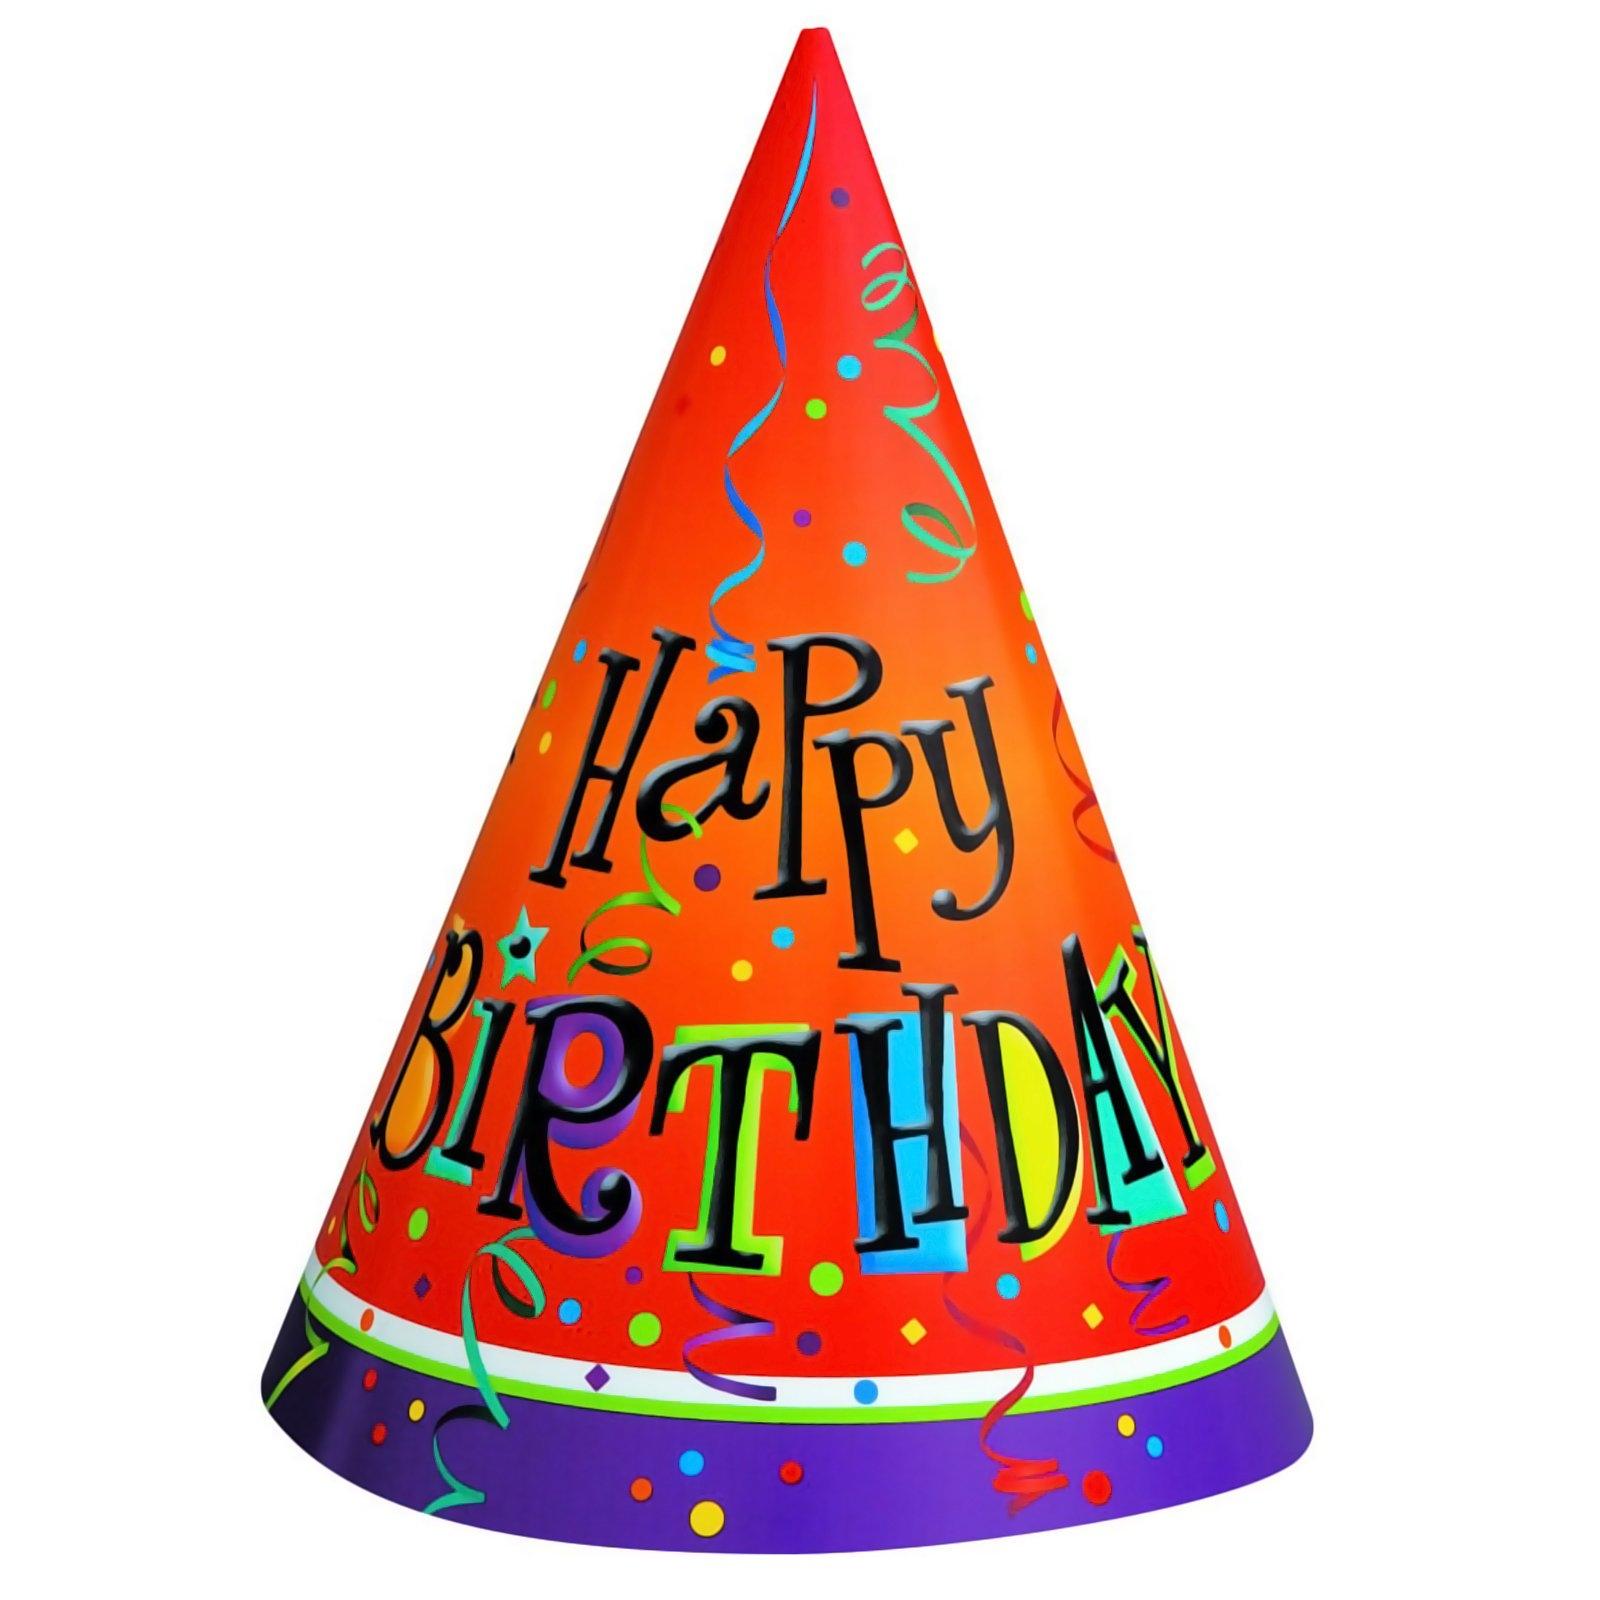 Birthday Hat Clipart No Background-Birthday Hat Clipart No Background-12